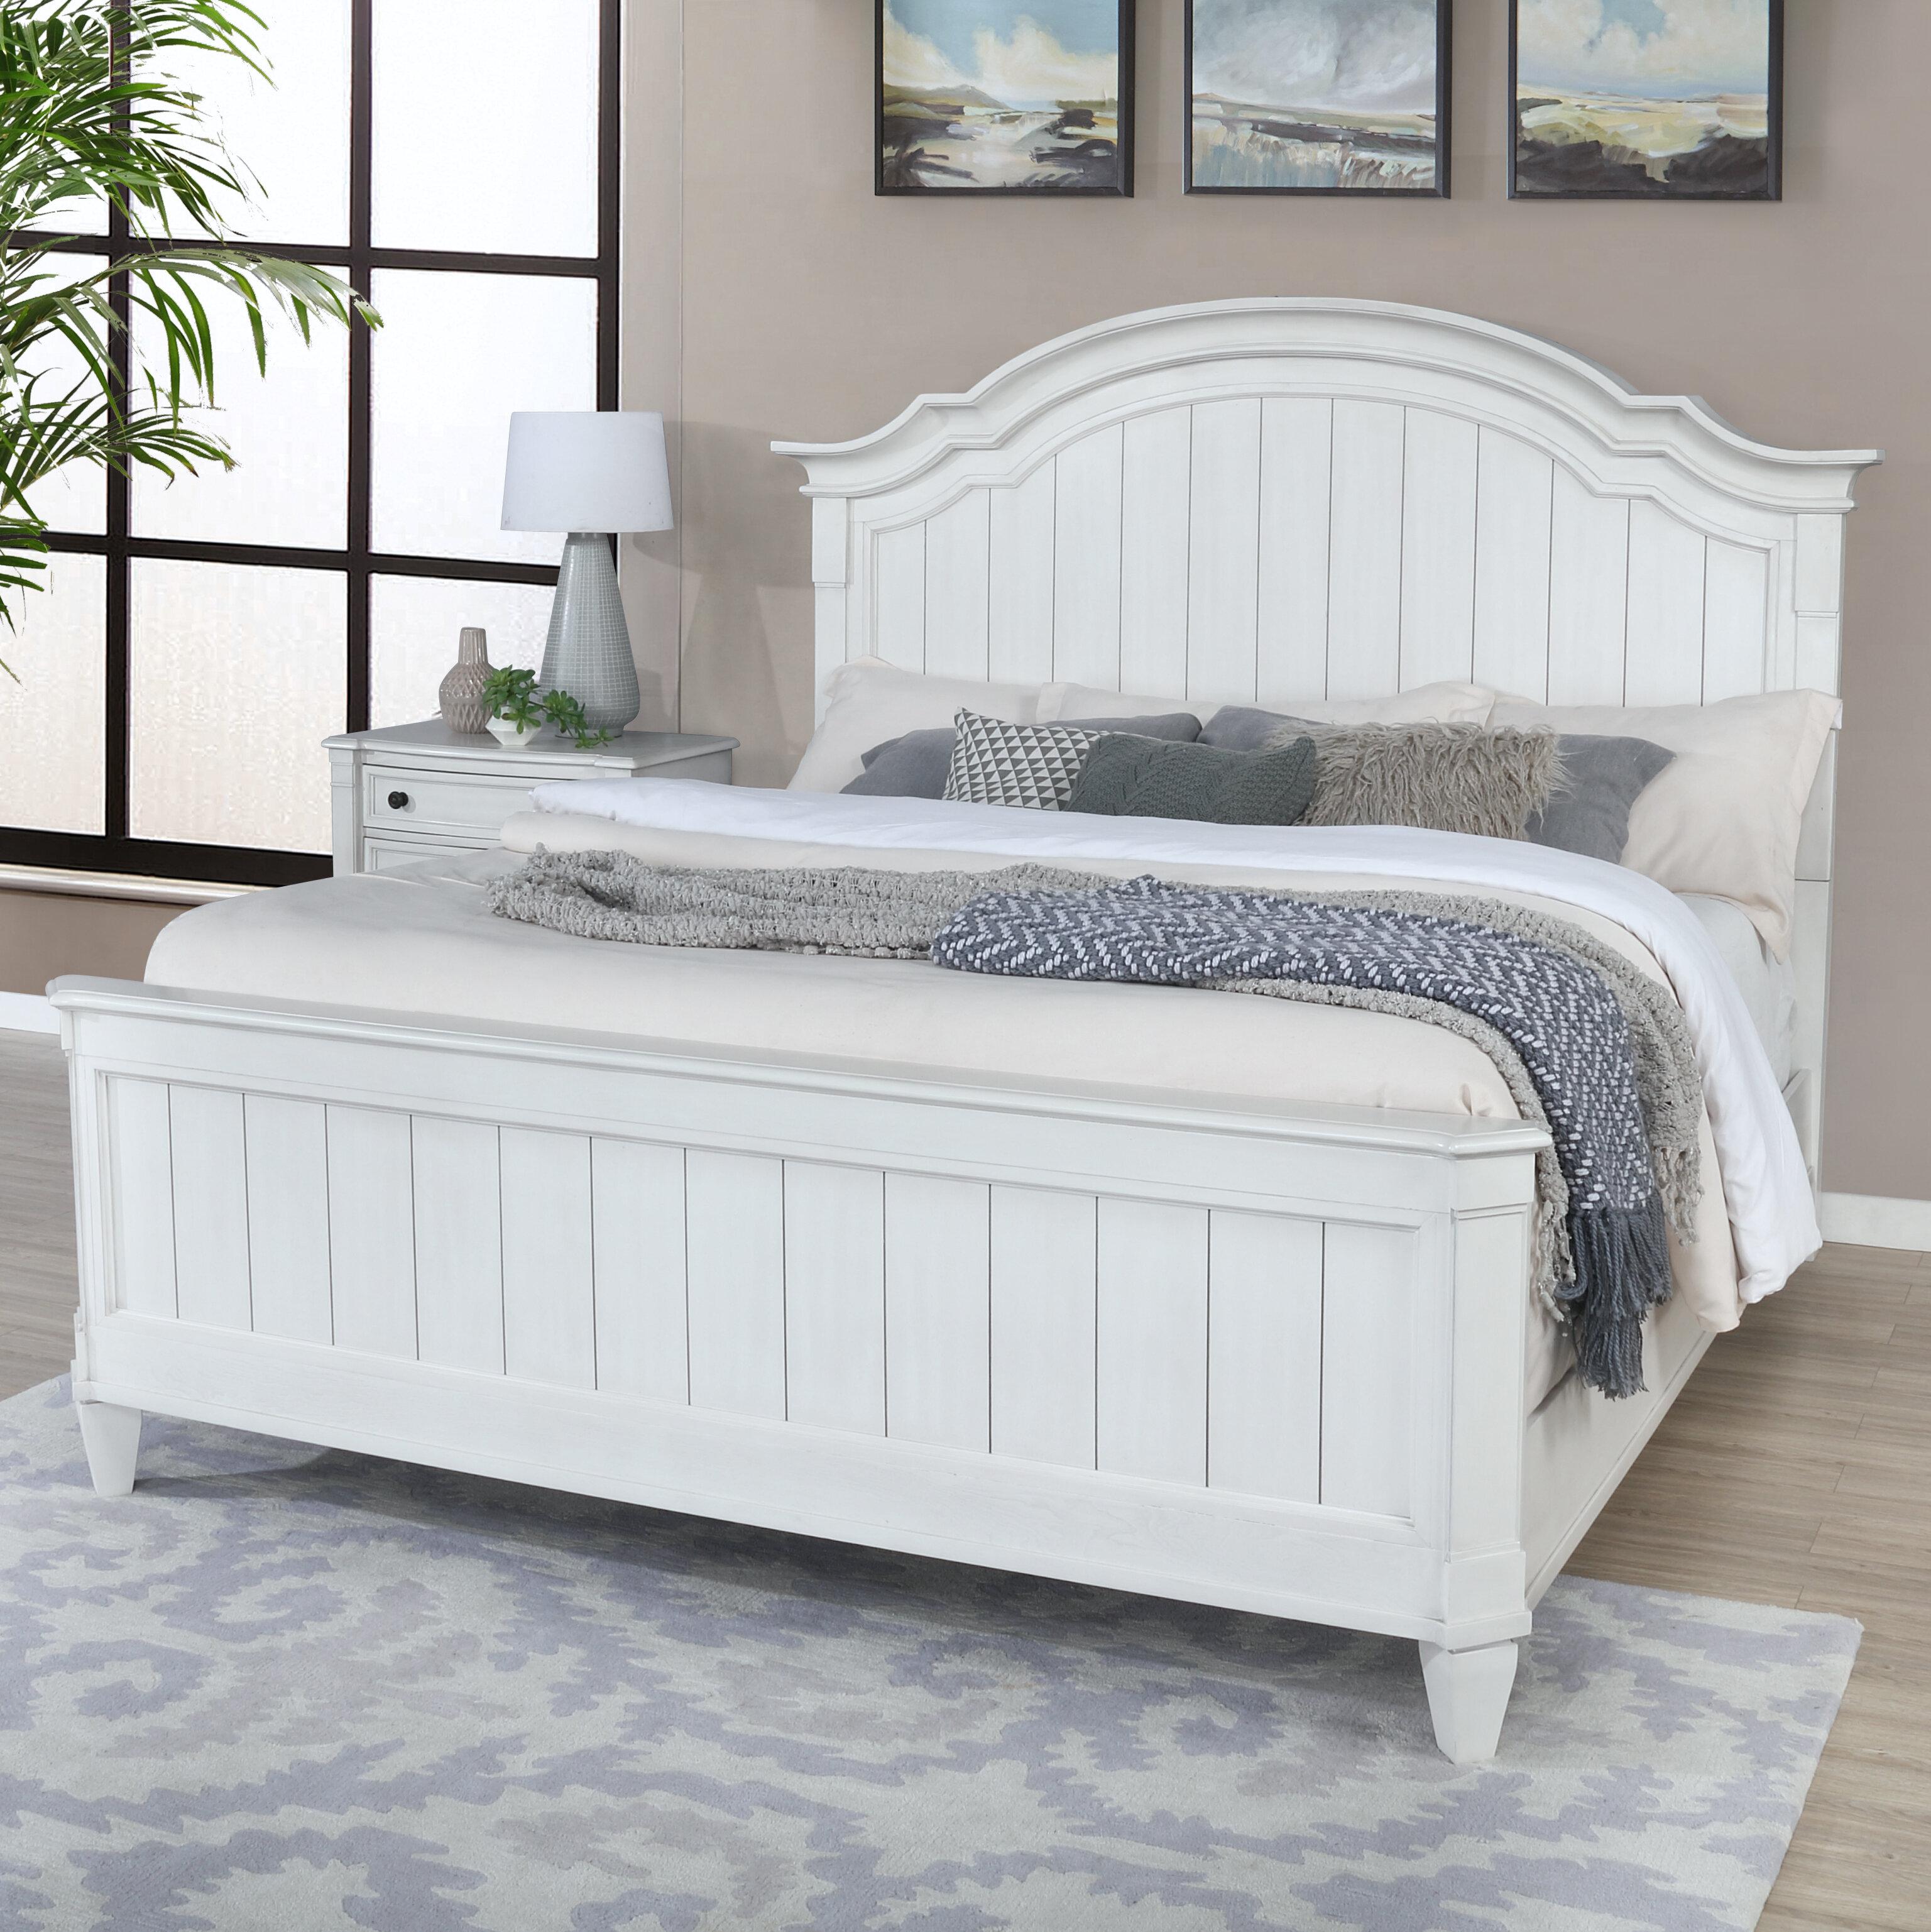 Ophelia Co Alayah Solid Wood Low Profile Platform Bed Wayfair